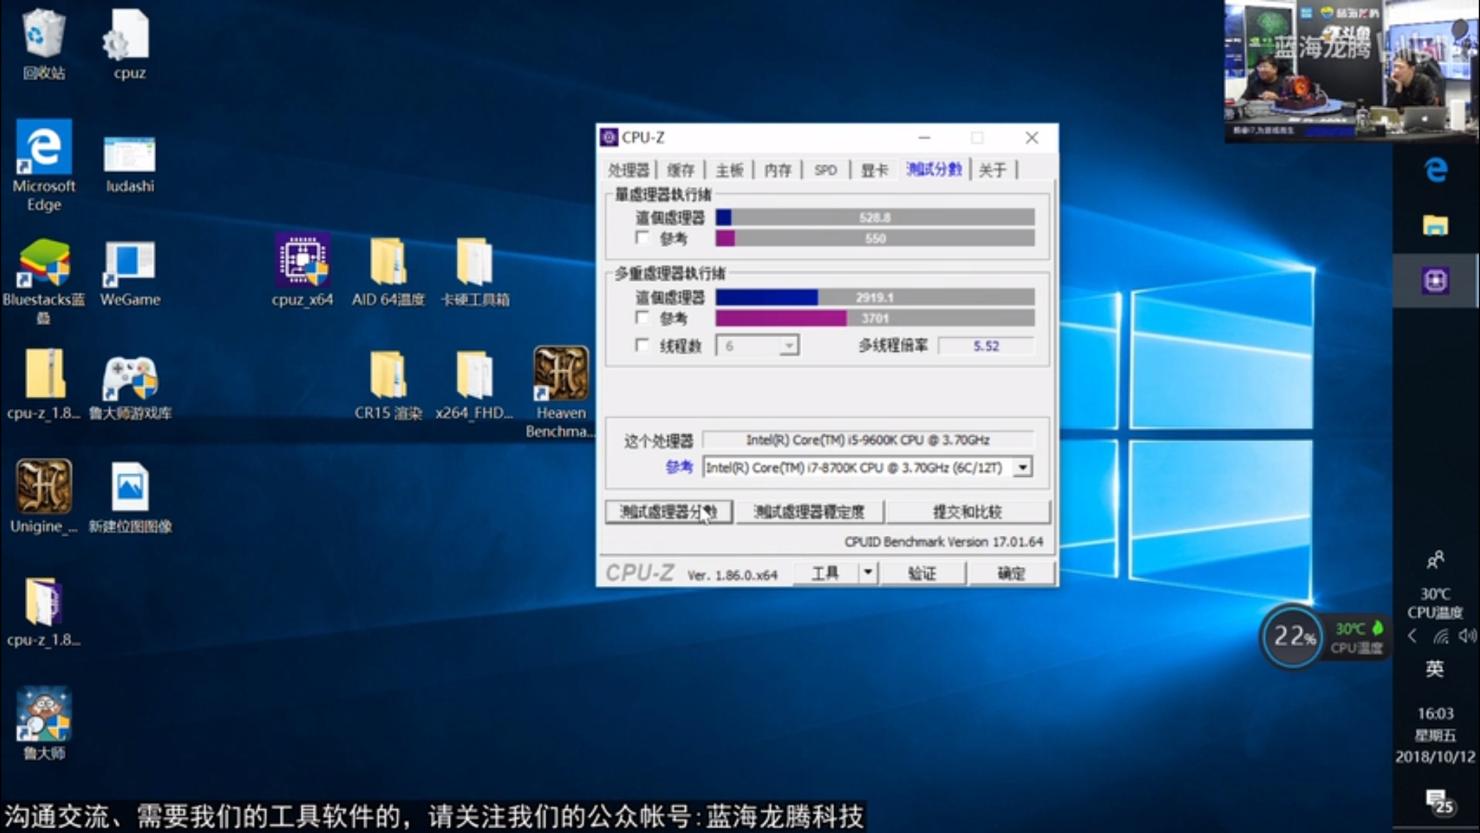 intel-core-i5-9600k-cpu-benchmarks_3